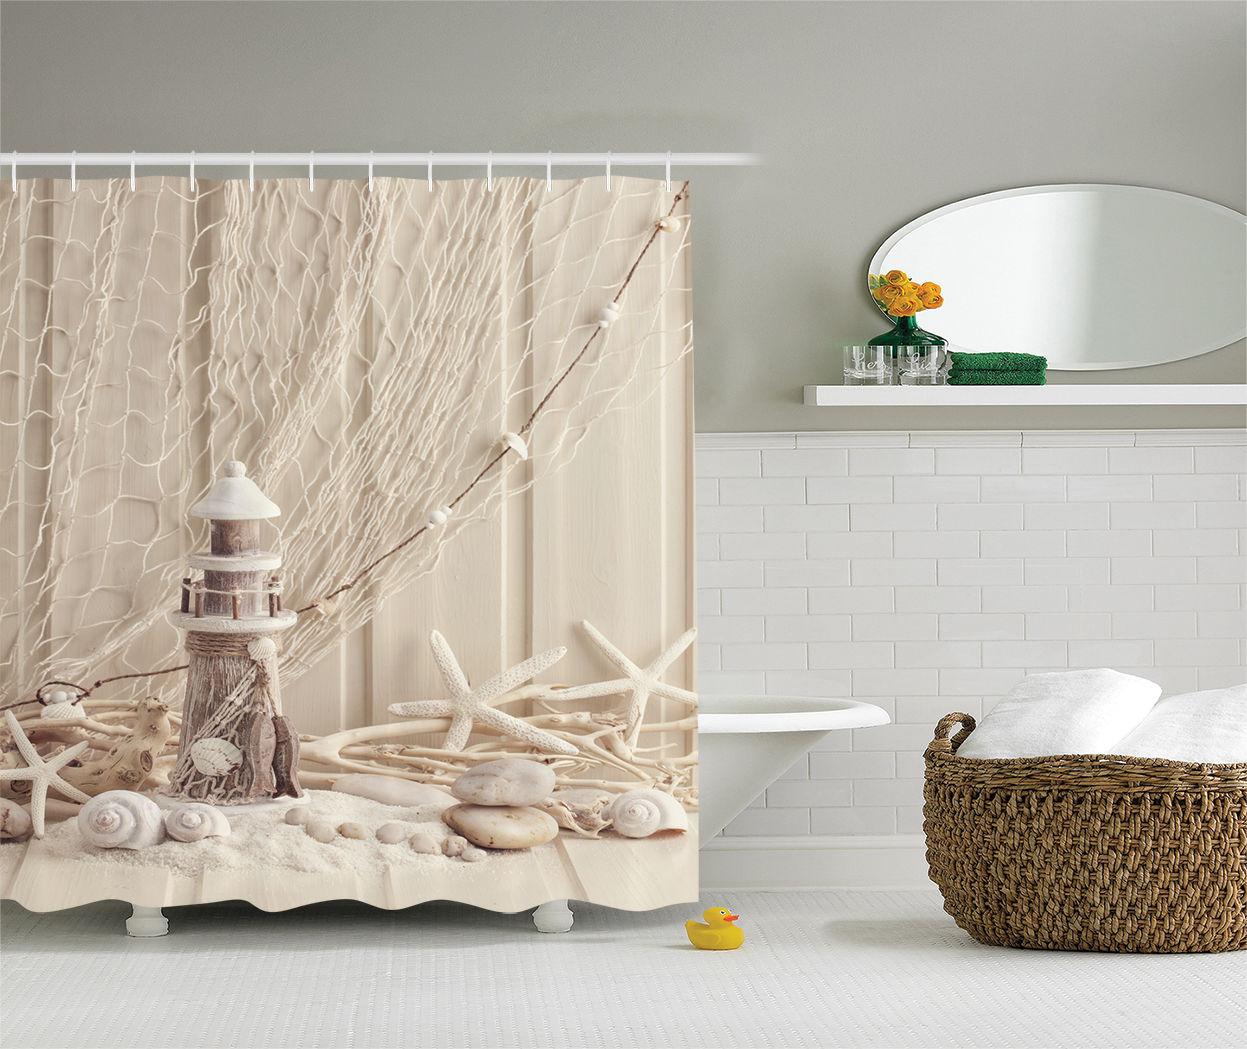 Underwater Shower Curtain Marine Fishing Net Print for Bathroom